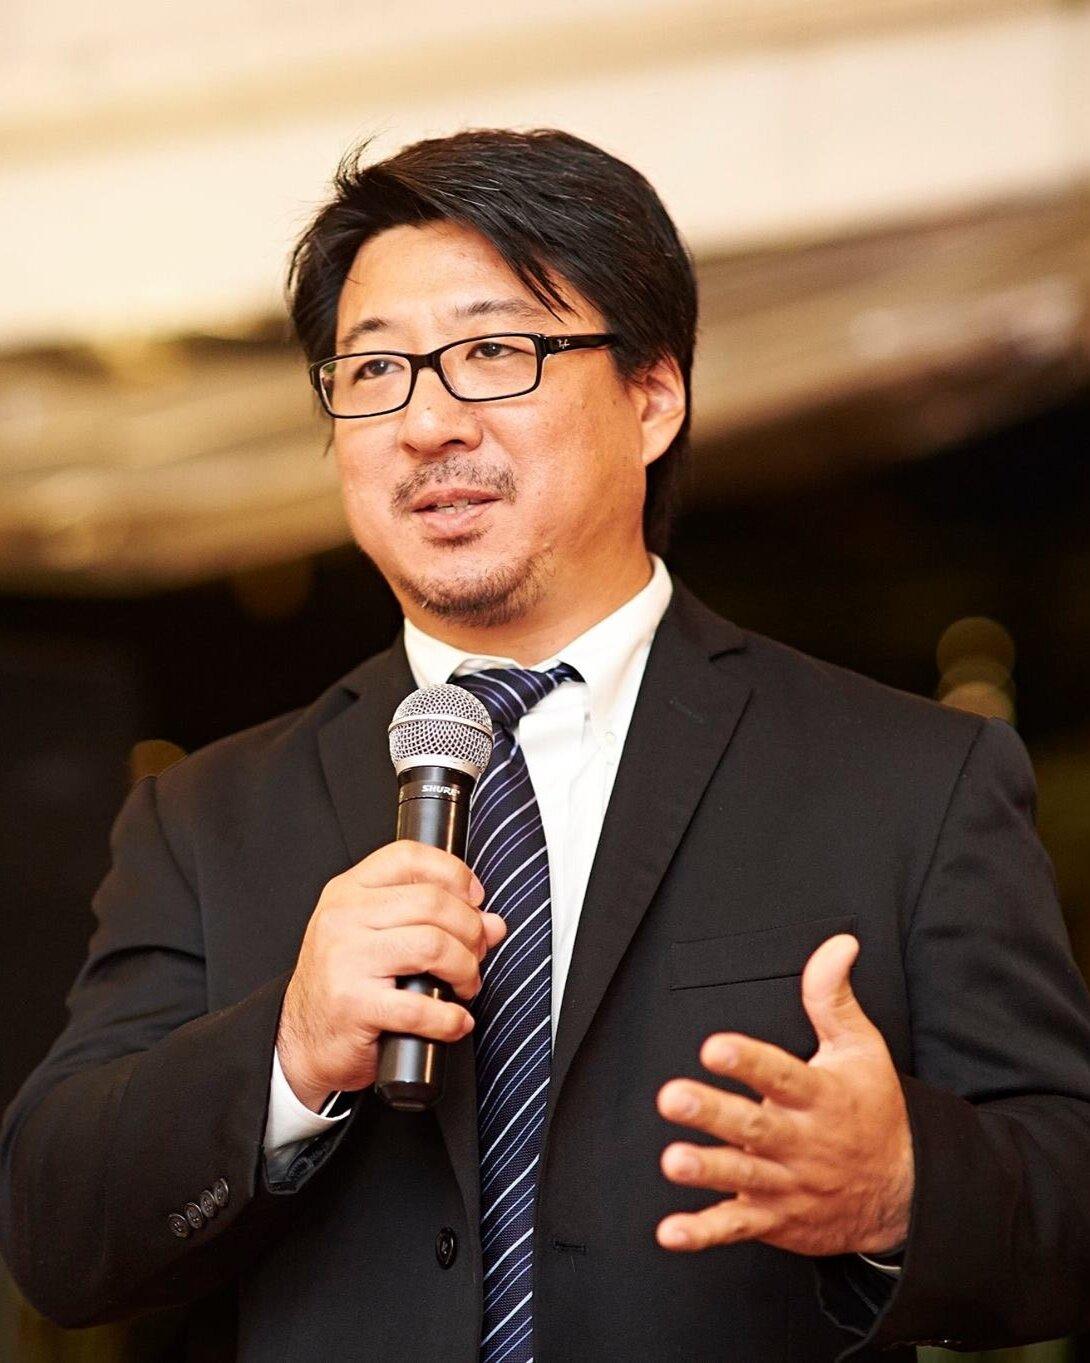 Rev. Shawn Kang - Central Associate